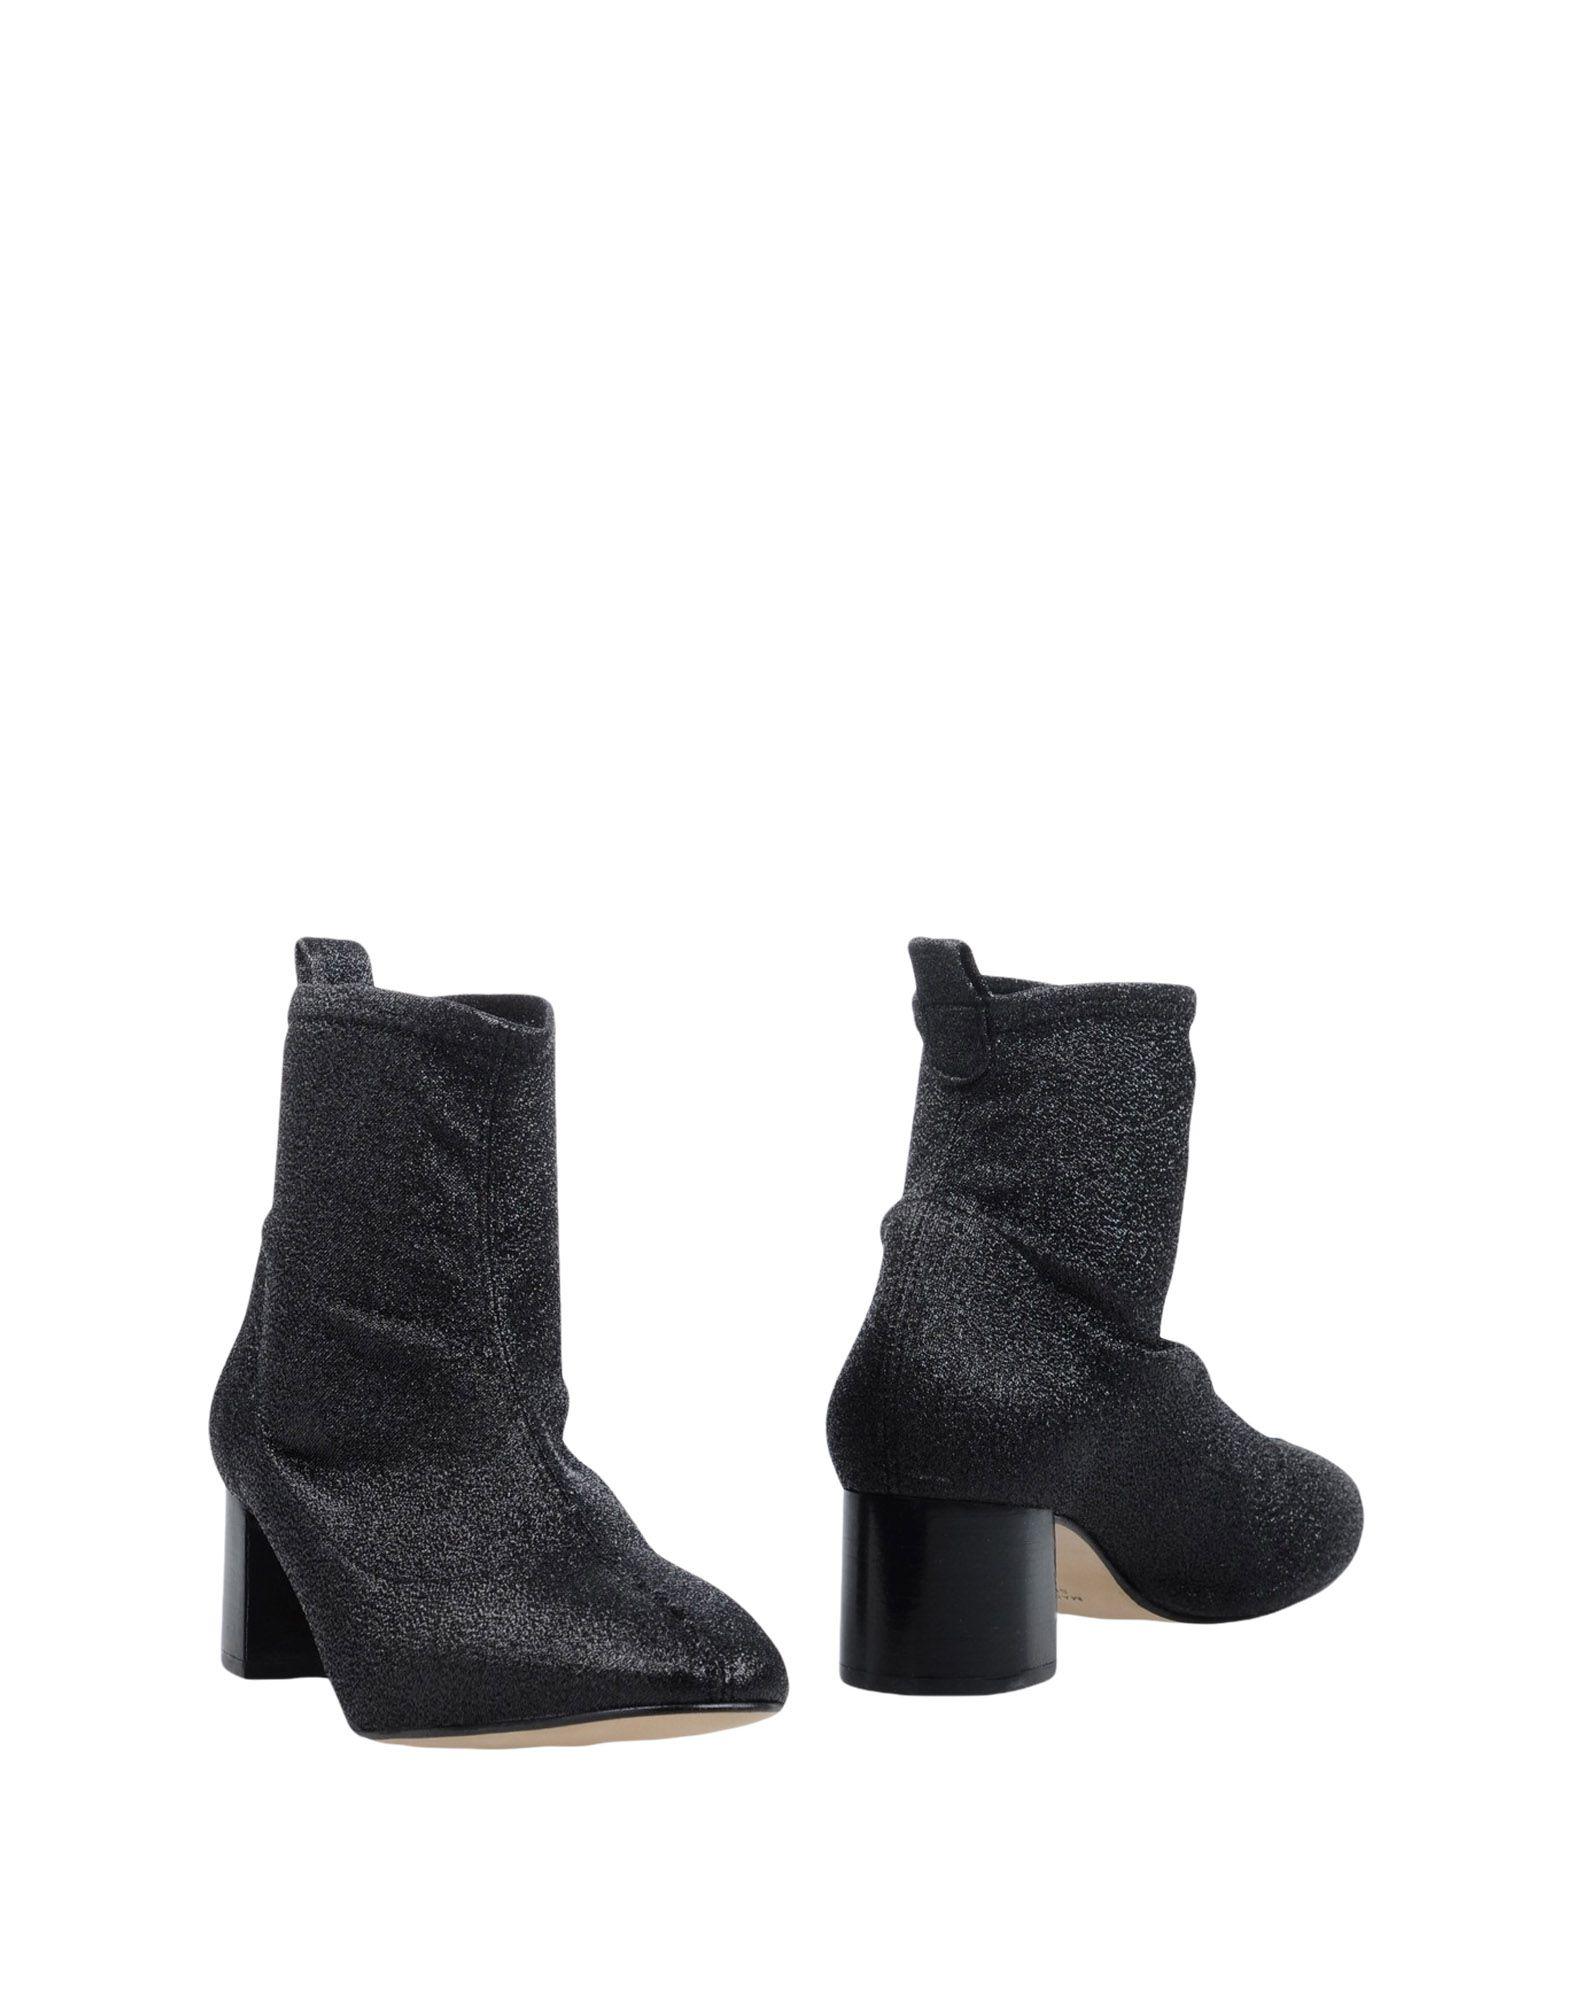 Cross Walk Stiefelette Damen  11257945MB Gute Qualität beliebte Schuhe